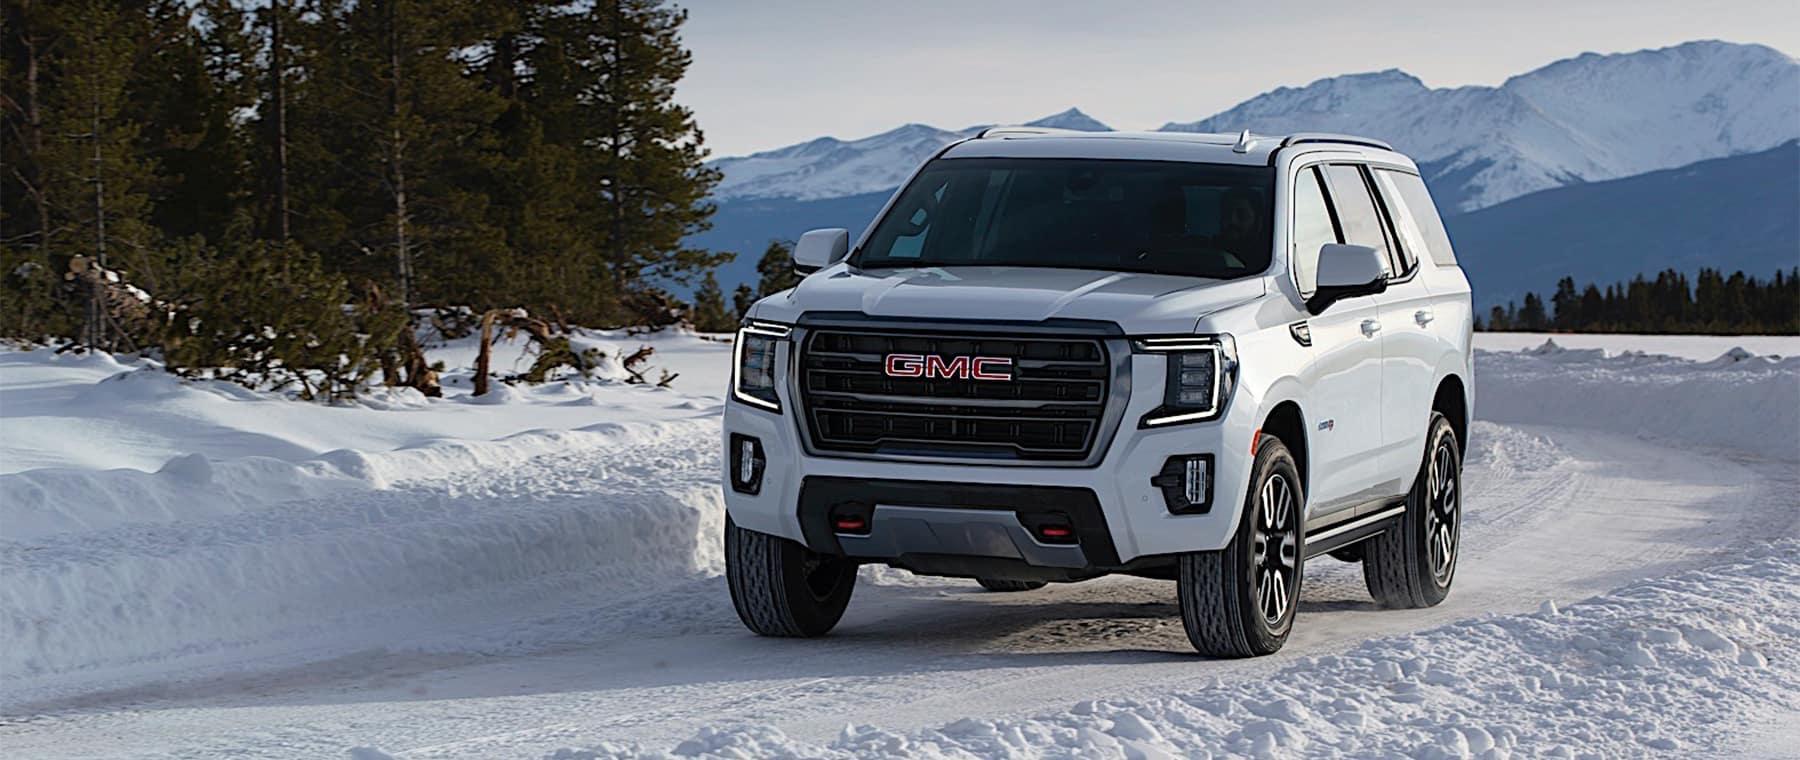 2021 GMC Yukon white driving on snowy path